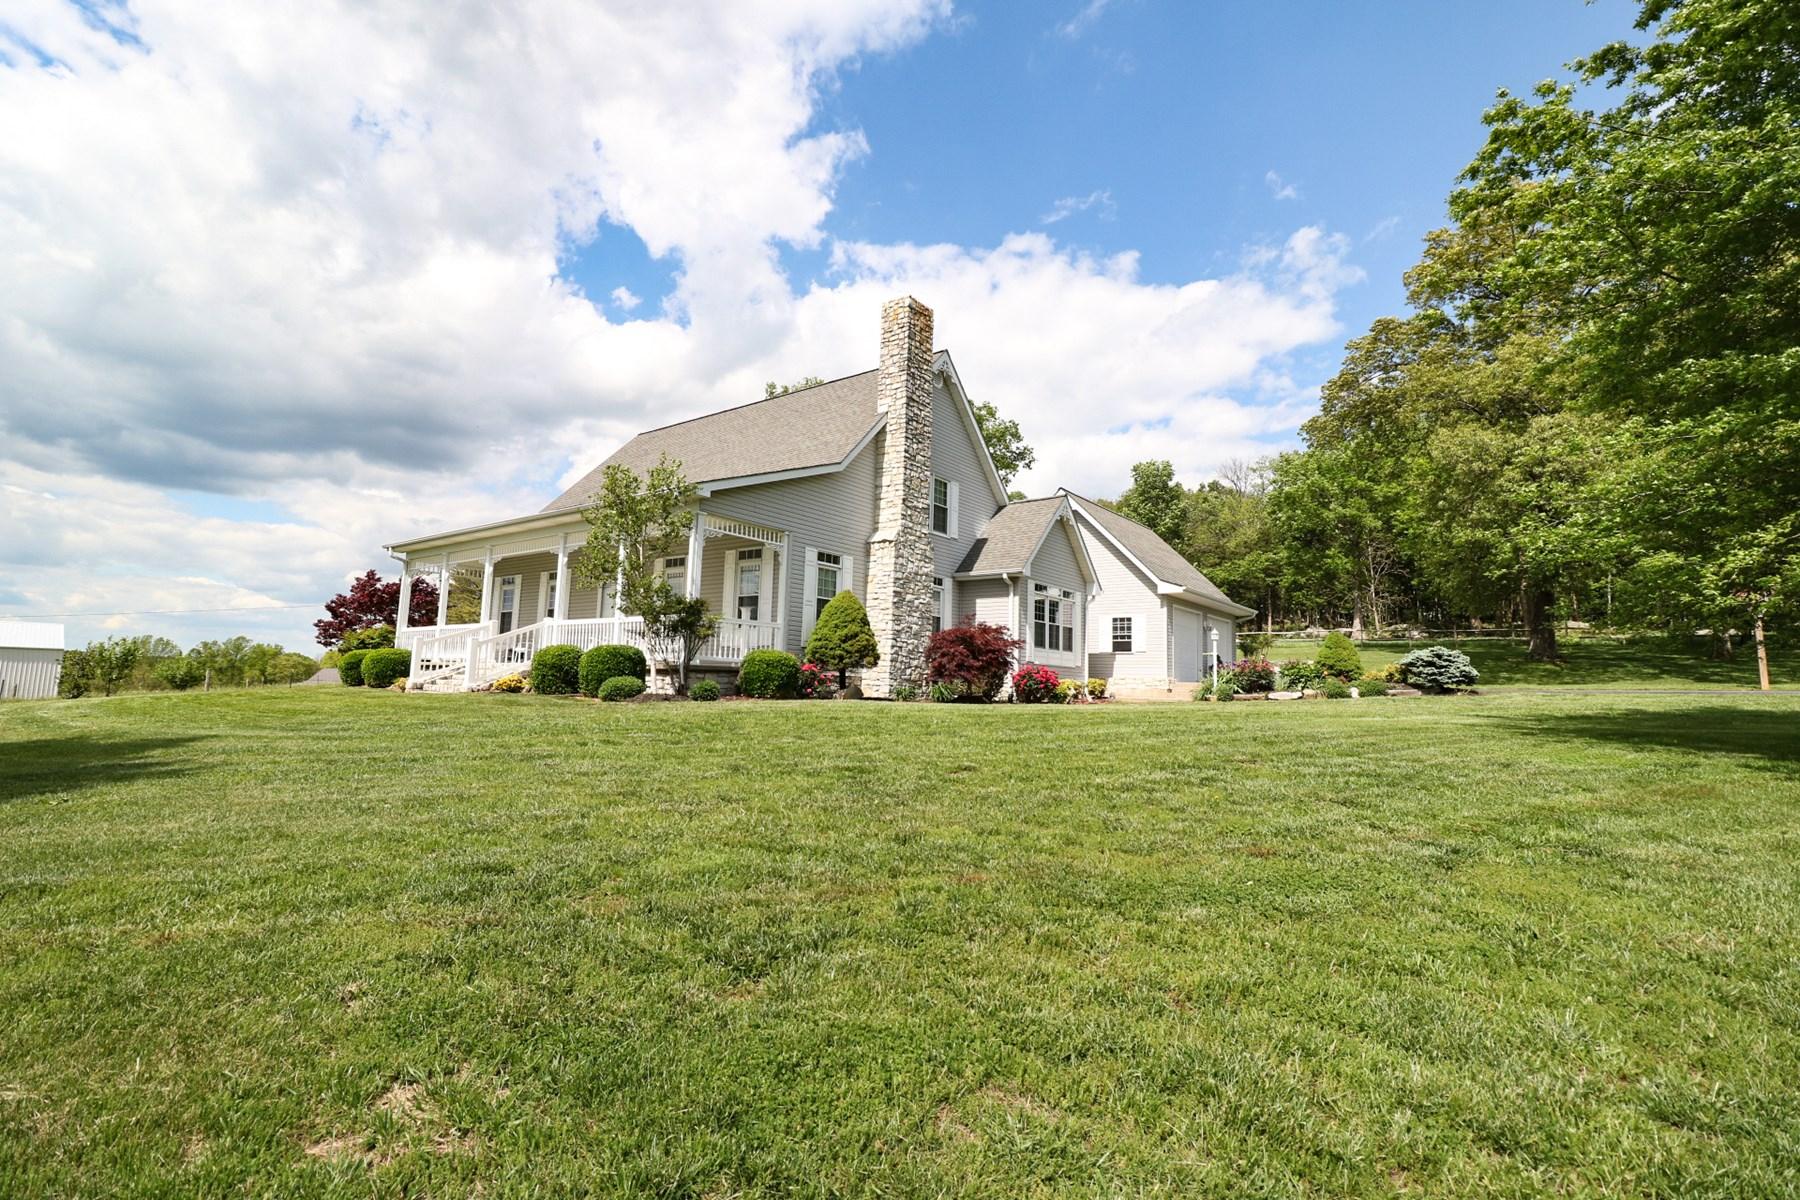 Country Home, Hobby Farm, Equine Property, 10 acres Kentucky